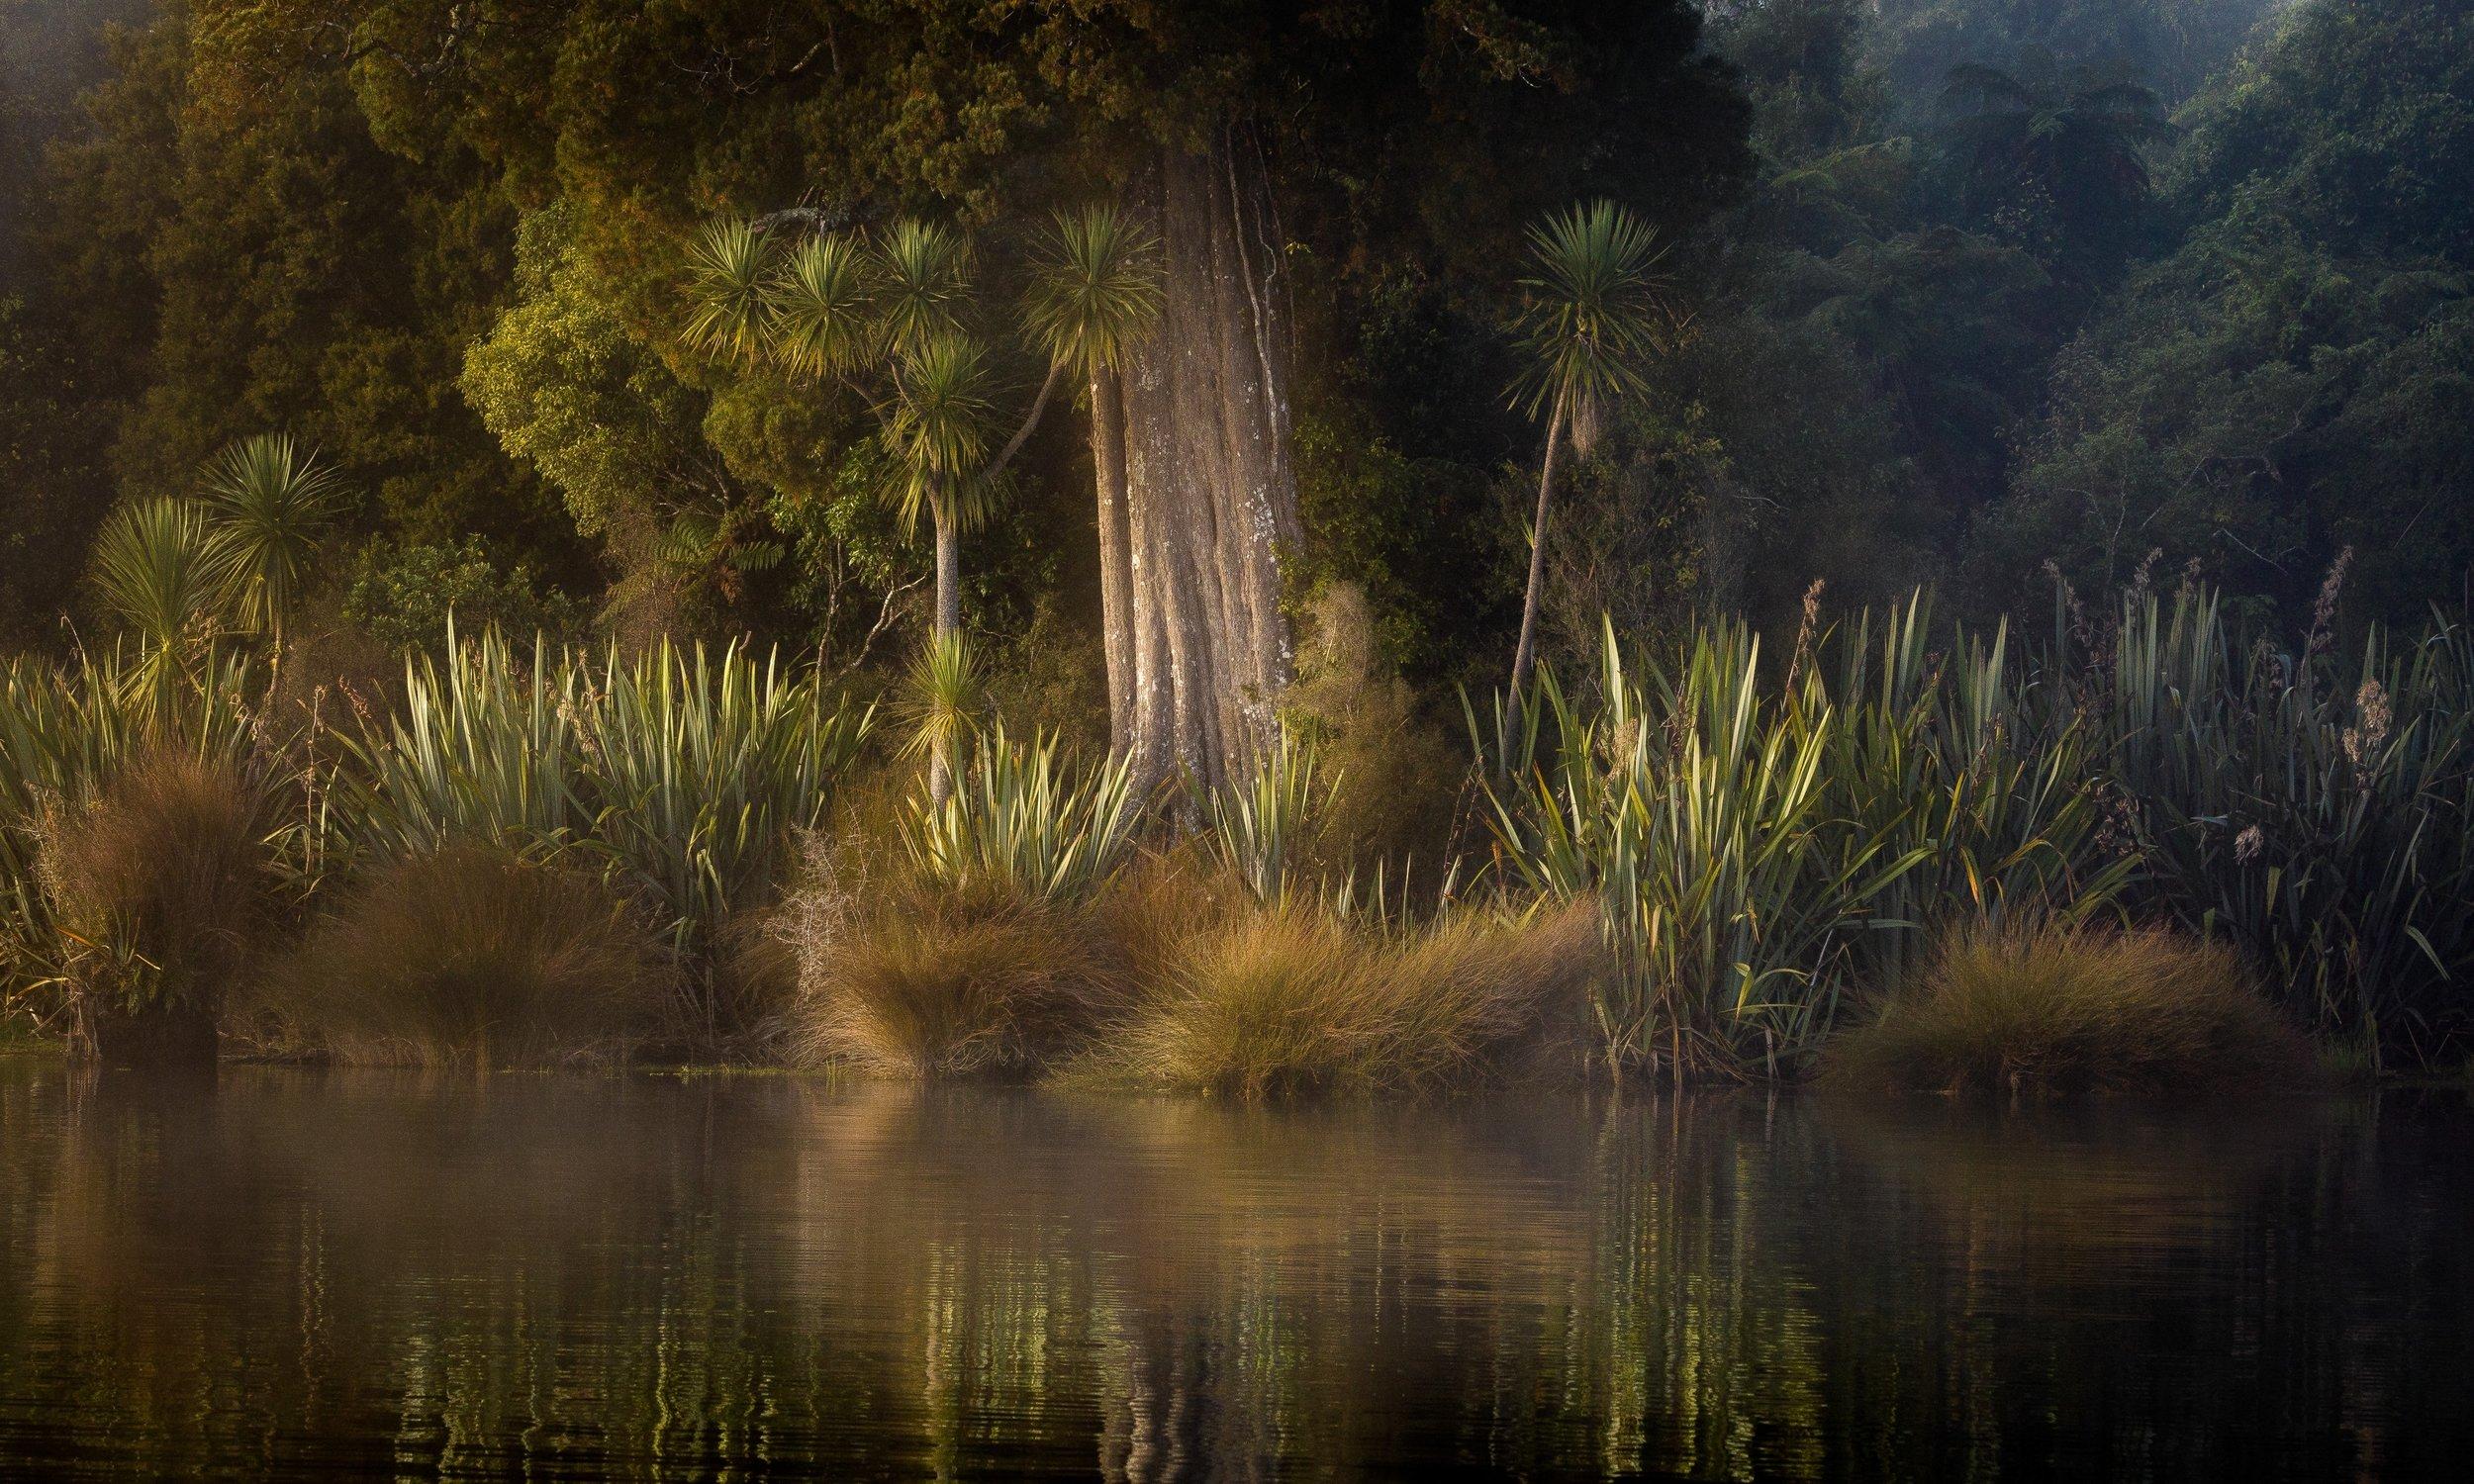 Brian Eastwood, Ancient Forest, Gold, 2018 Laurie Thomas Landscape Salon